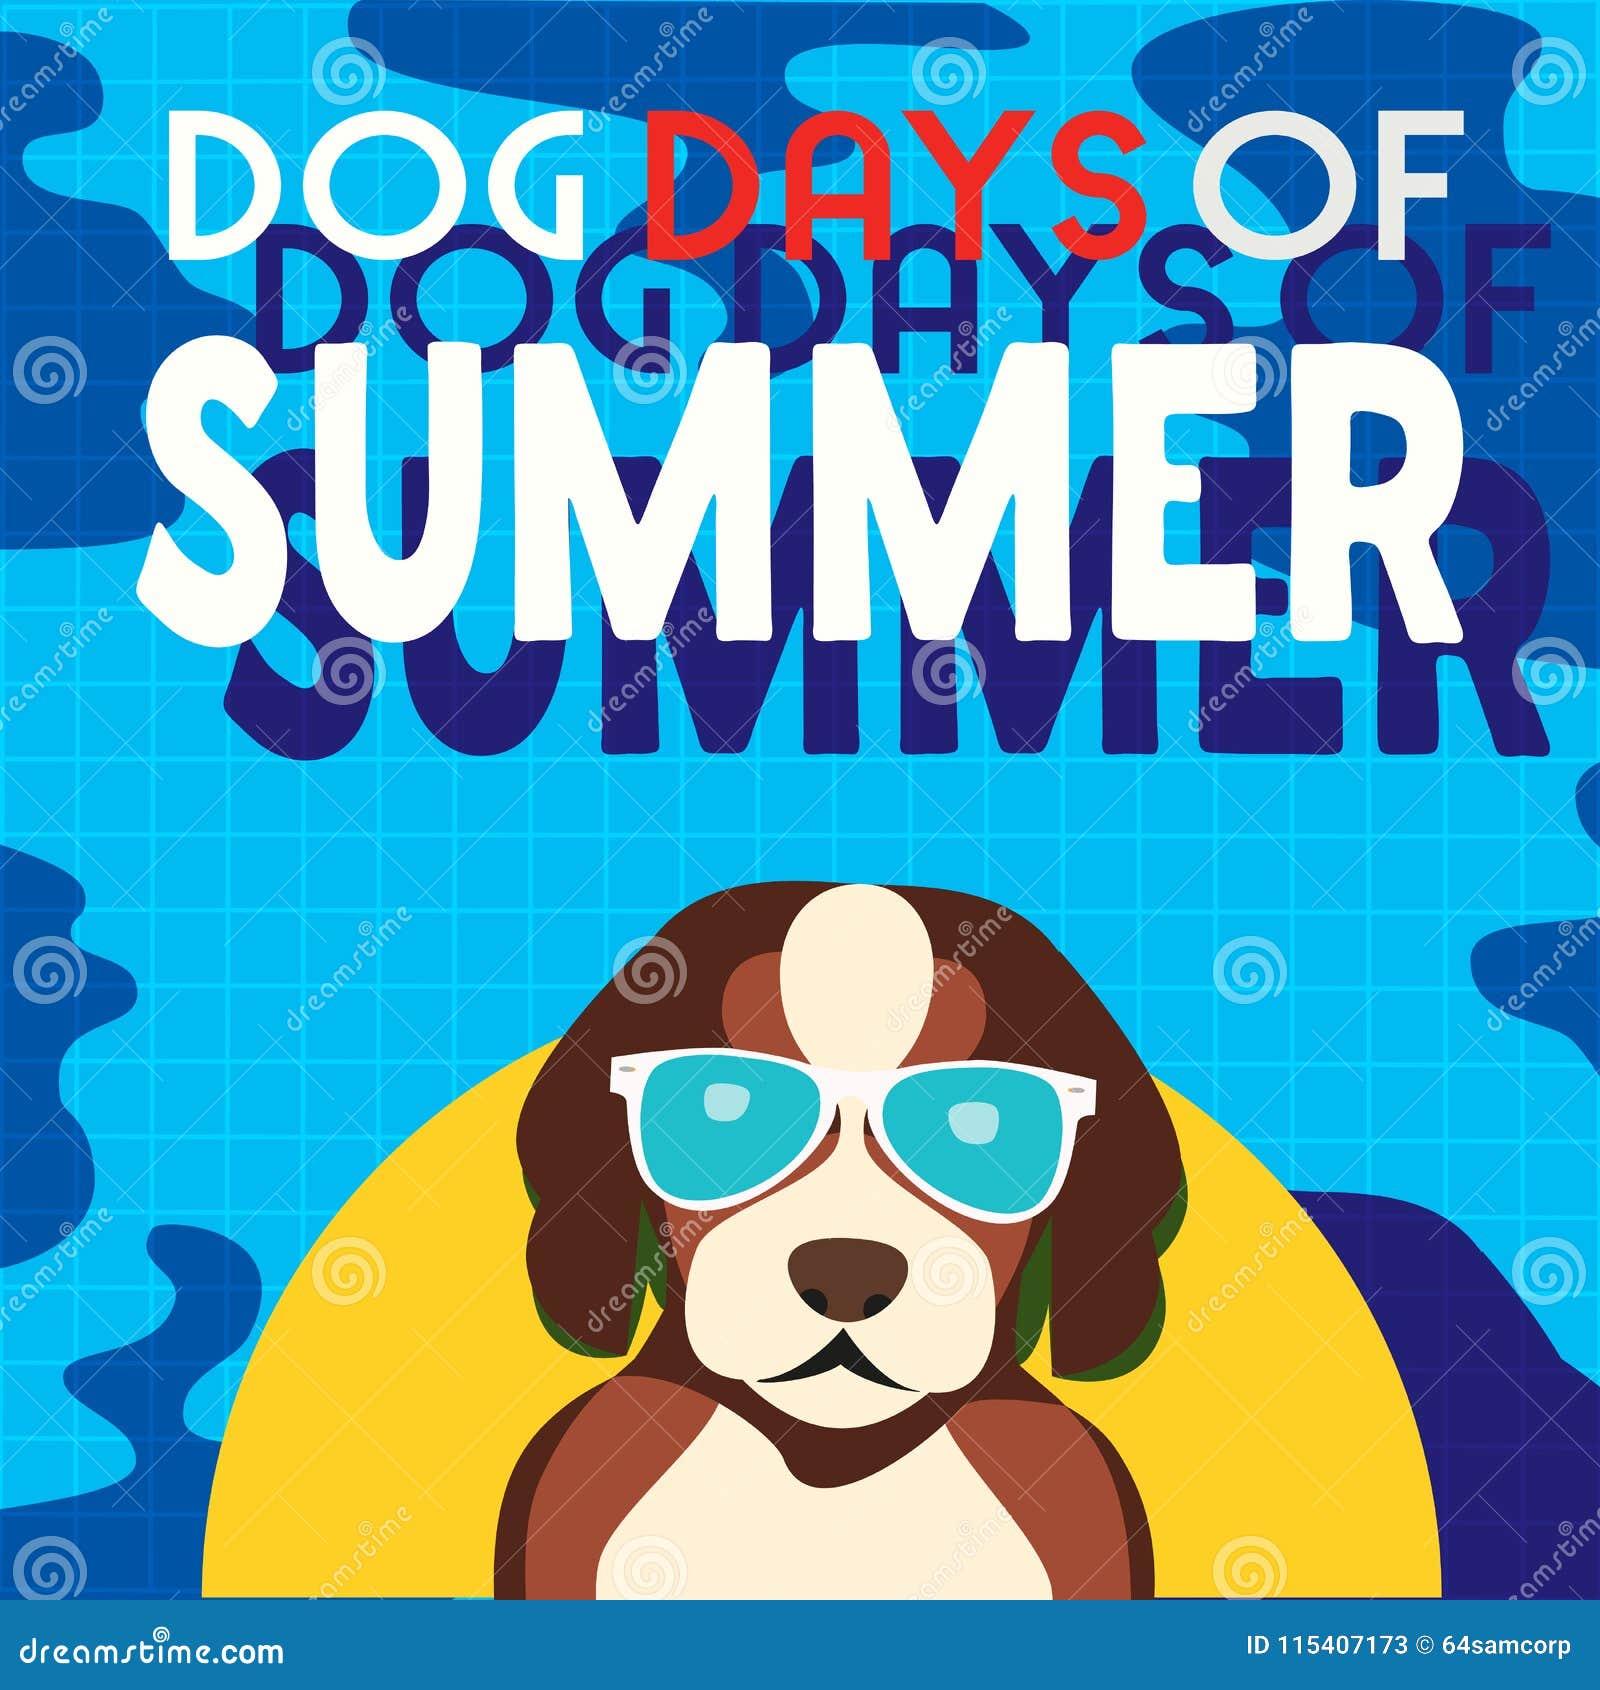 Dog days of summer stock illustration. Illustration of ...